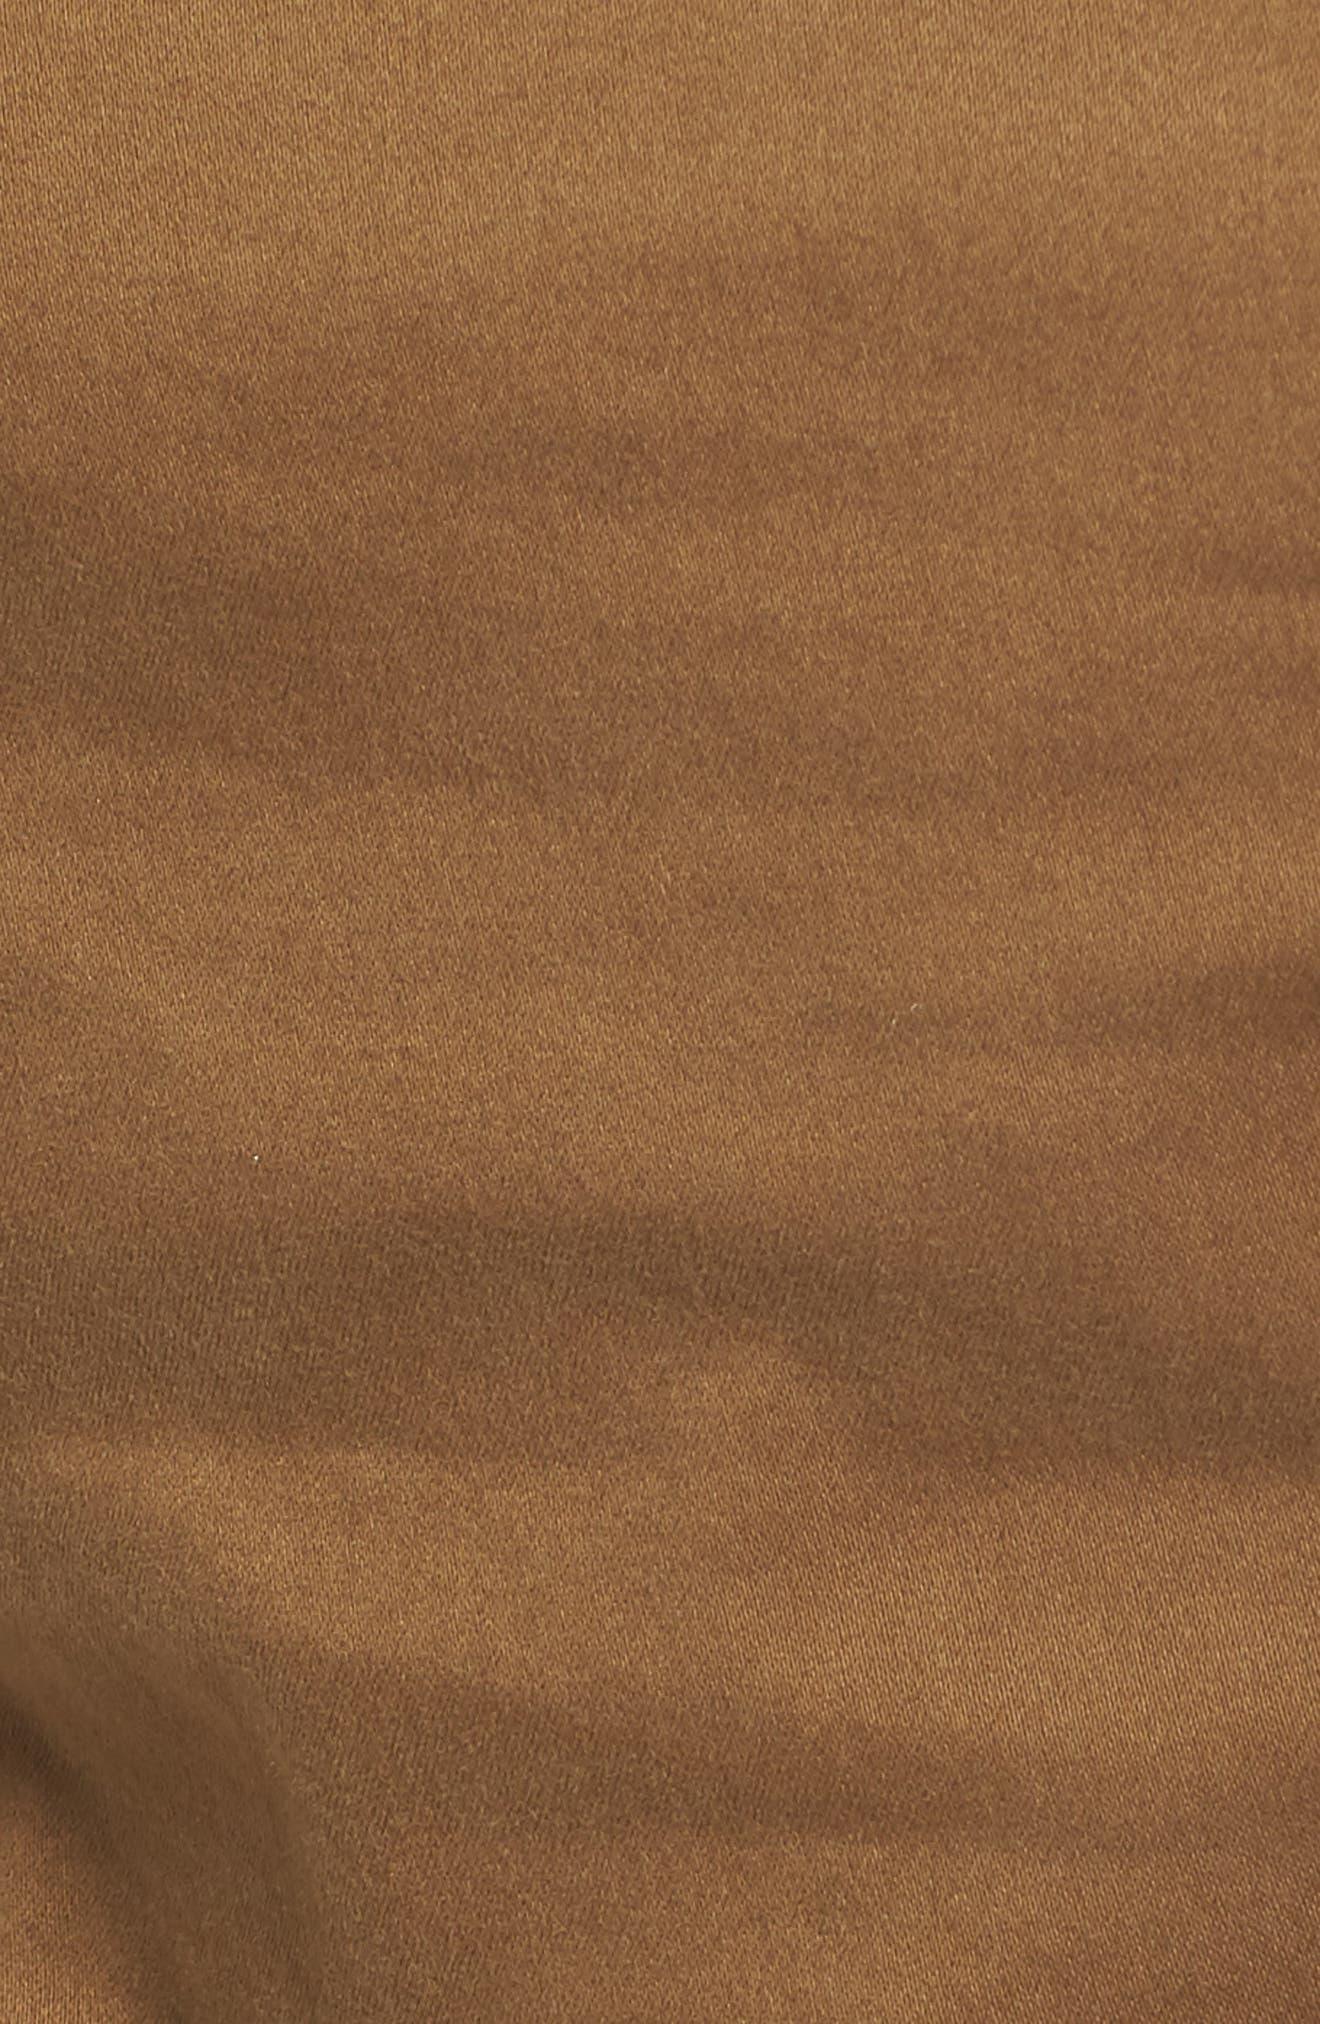 Shay 2 Cargo Pants,                             Alternate thumbnail 5, color,                             Open Beige